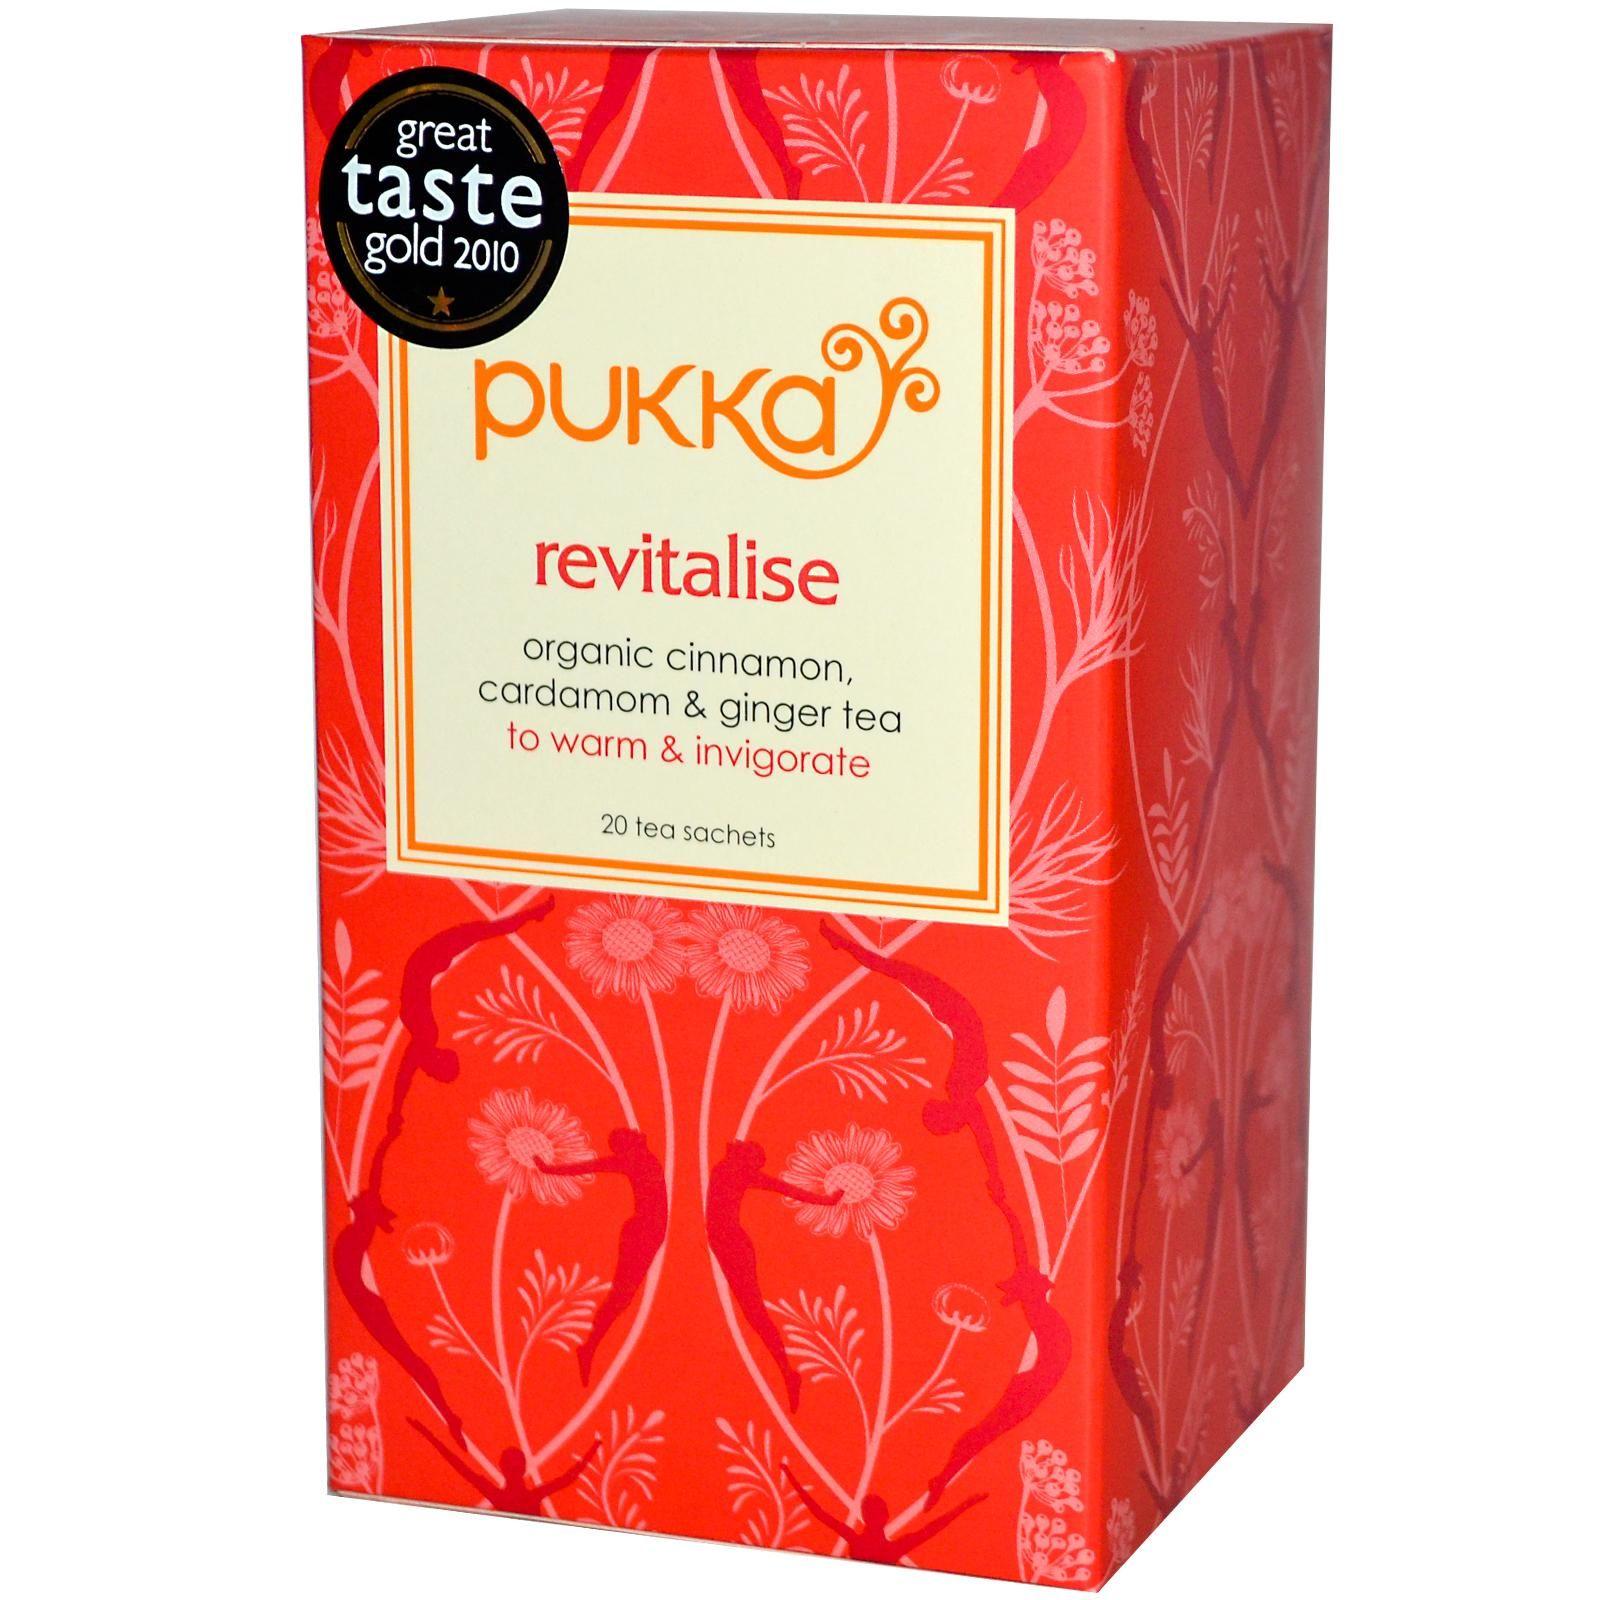 Pukka Herbs Revitalise Organic Cinnamon Cardamom Ginger Tea 20 Tea Sachets 1 41 Oz 40 G Iherb Com